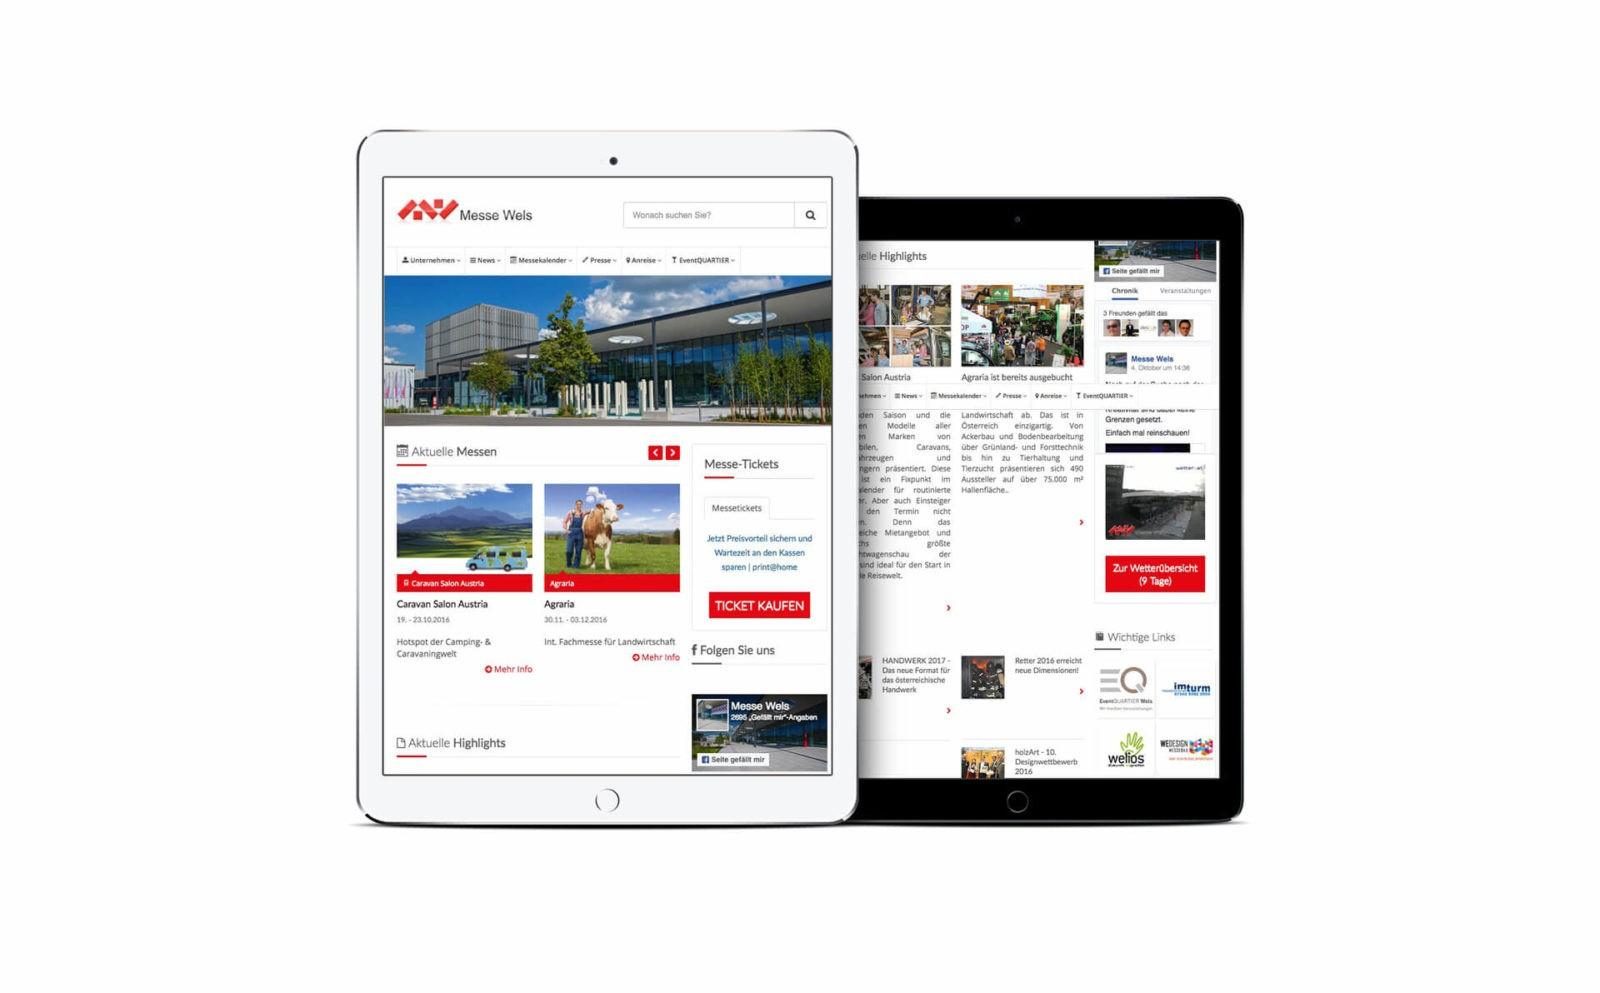 Mobile Webseiten der Messe Wels